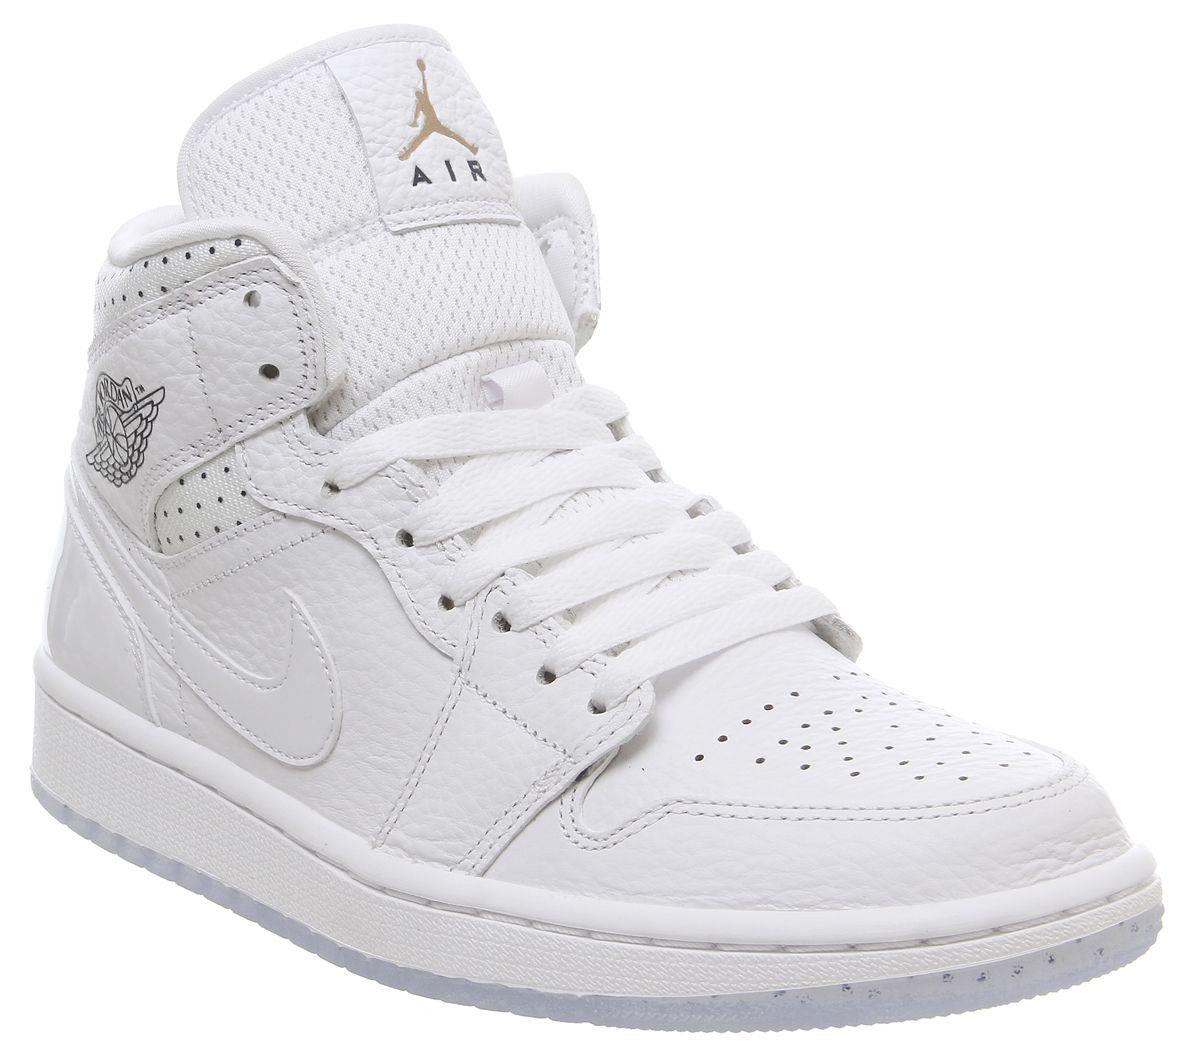 chaussures de sport 7231f b3341 Jordan Air Jordan 1 Mid Trainers White Midnight Navy Rose ...